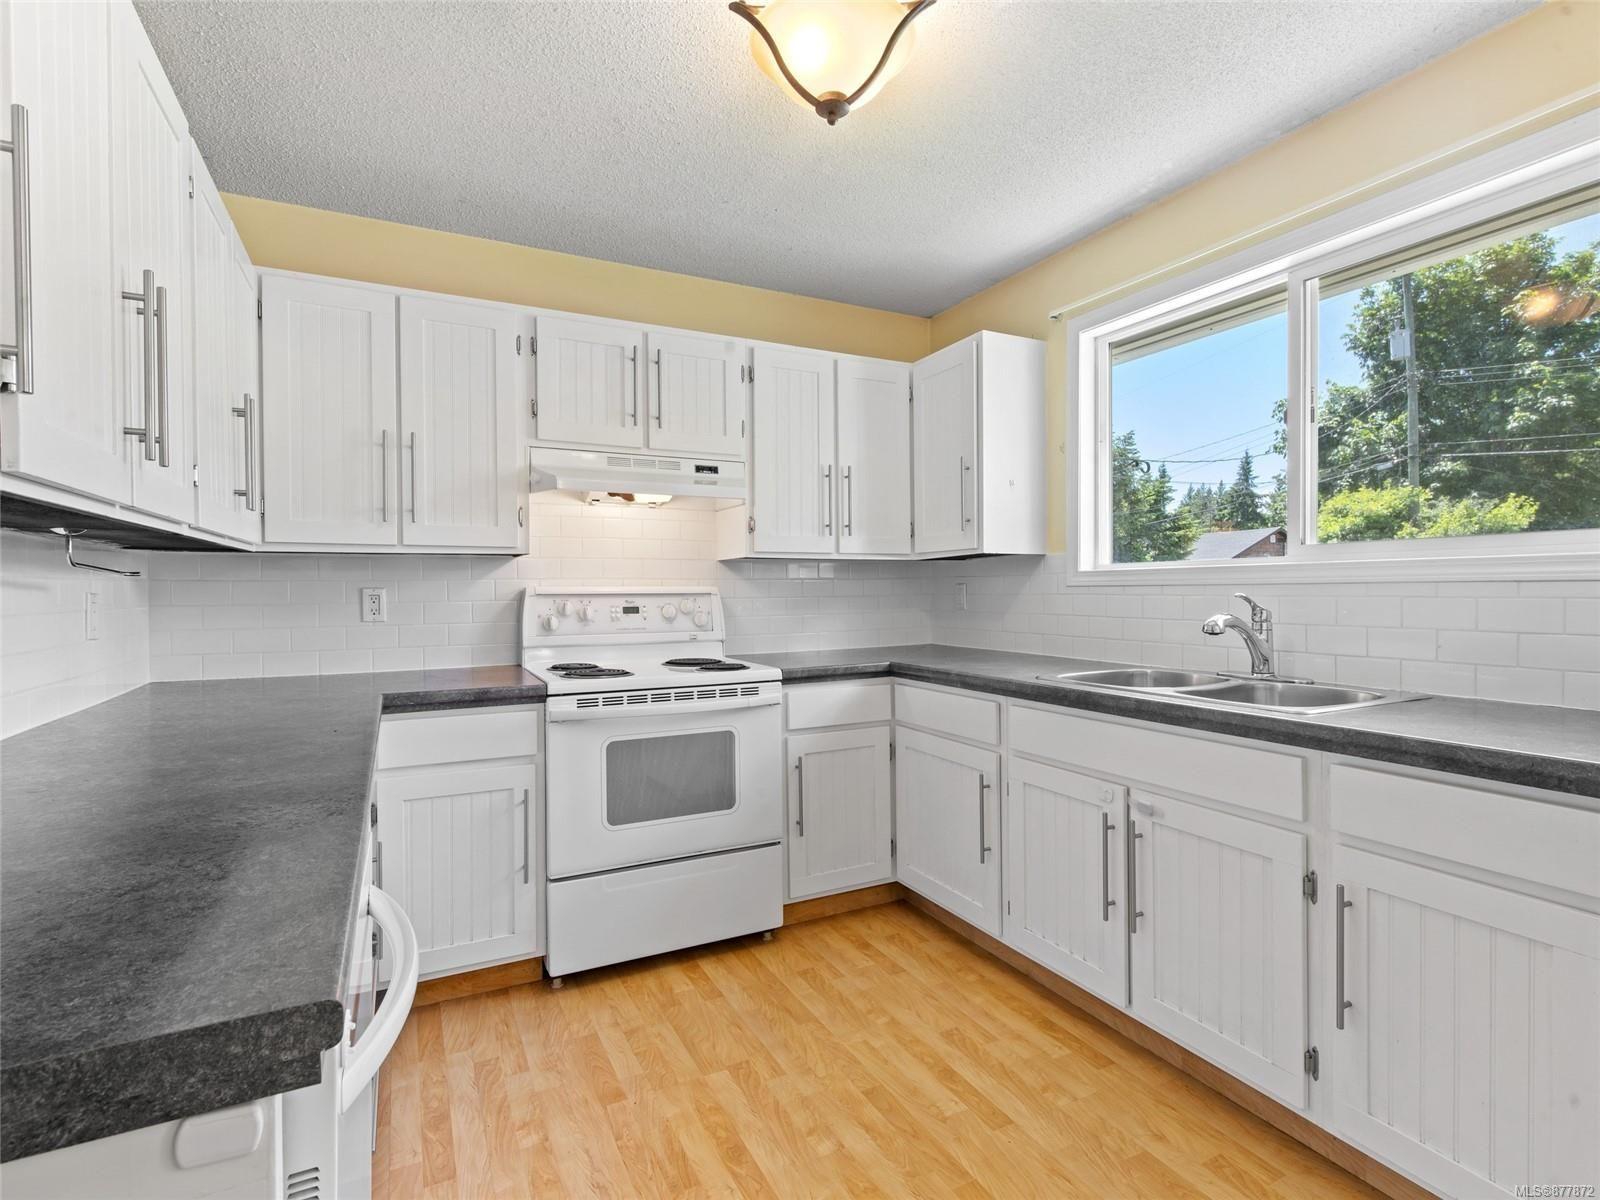 Photo 6: Photos: 7865 Wardrop Rd in : PA Port Alberni House for sale (Port Alberni)  : MLS®# 877872